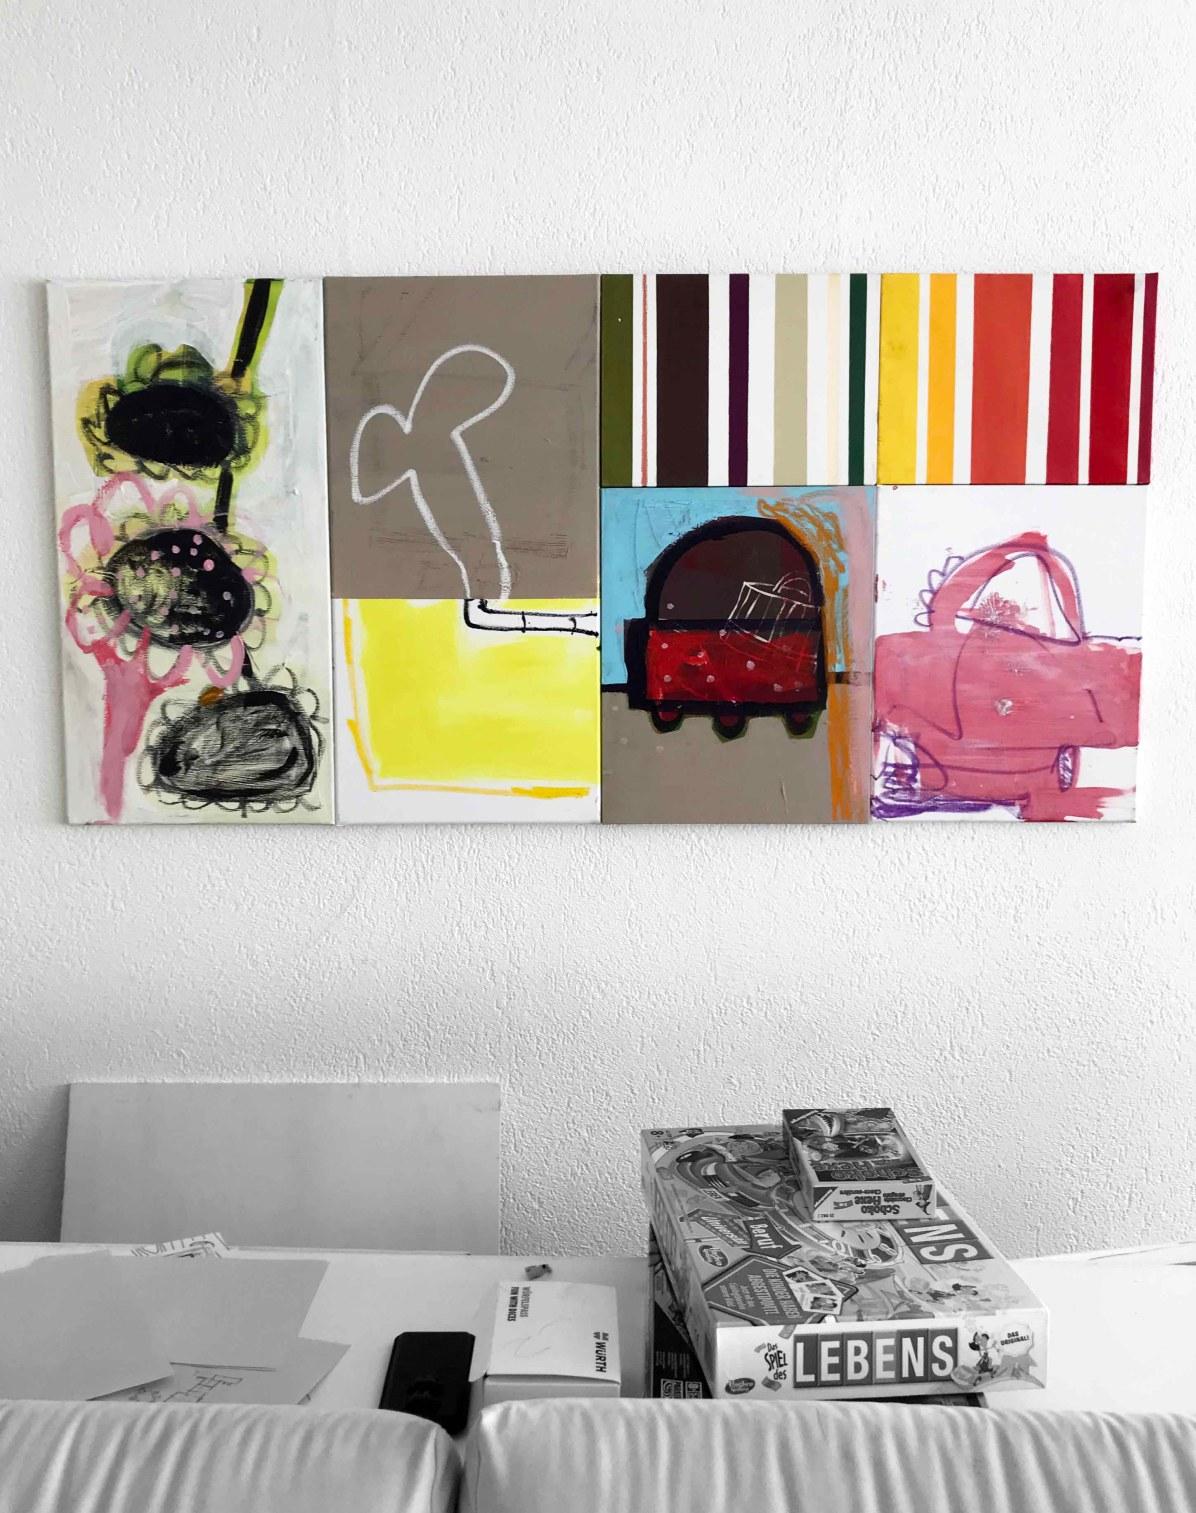 Serie Aluis C., 2019, Acryl, Spray, Ölstick, Markerstift, Papier